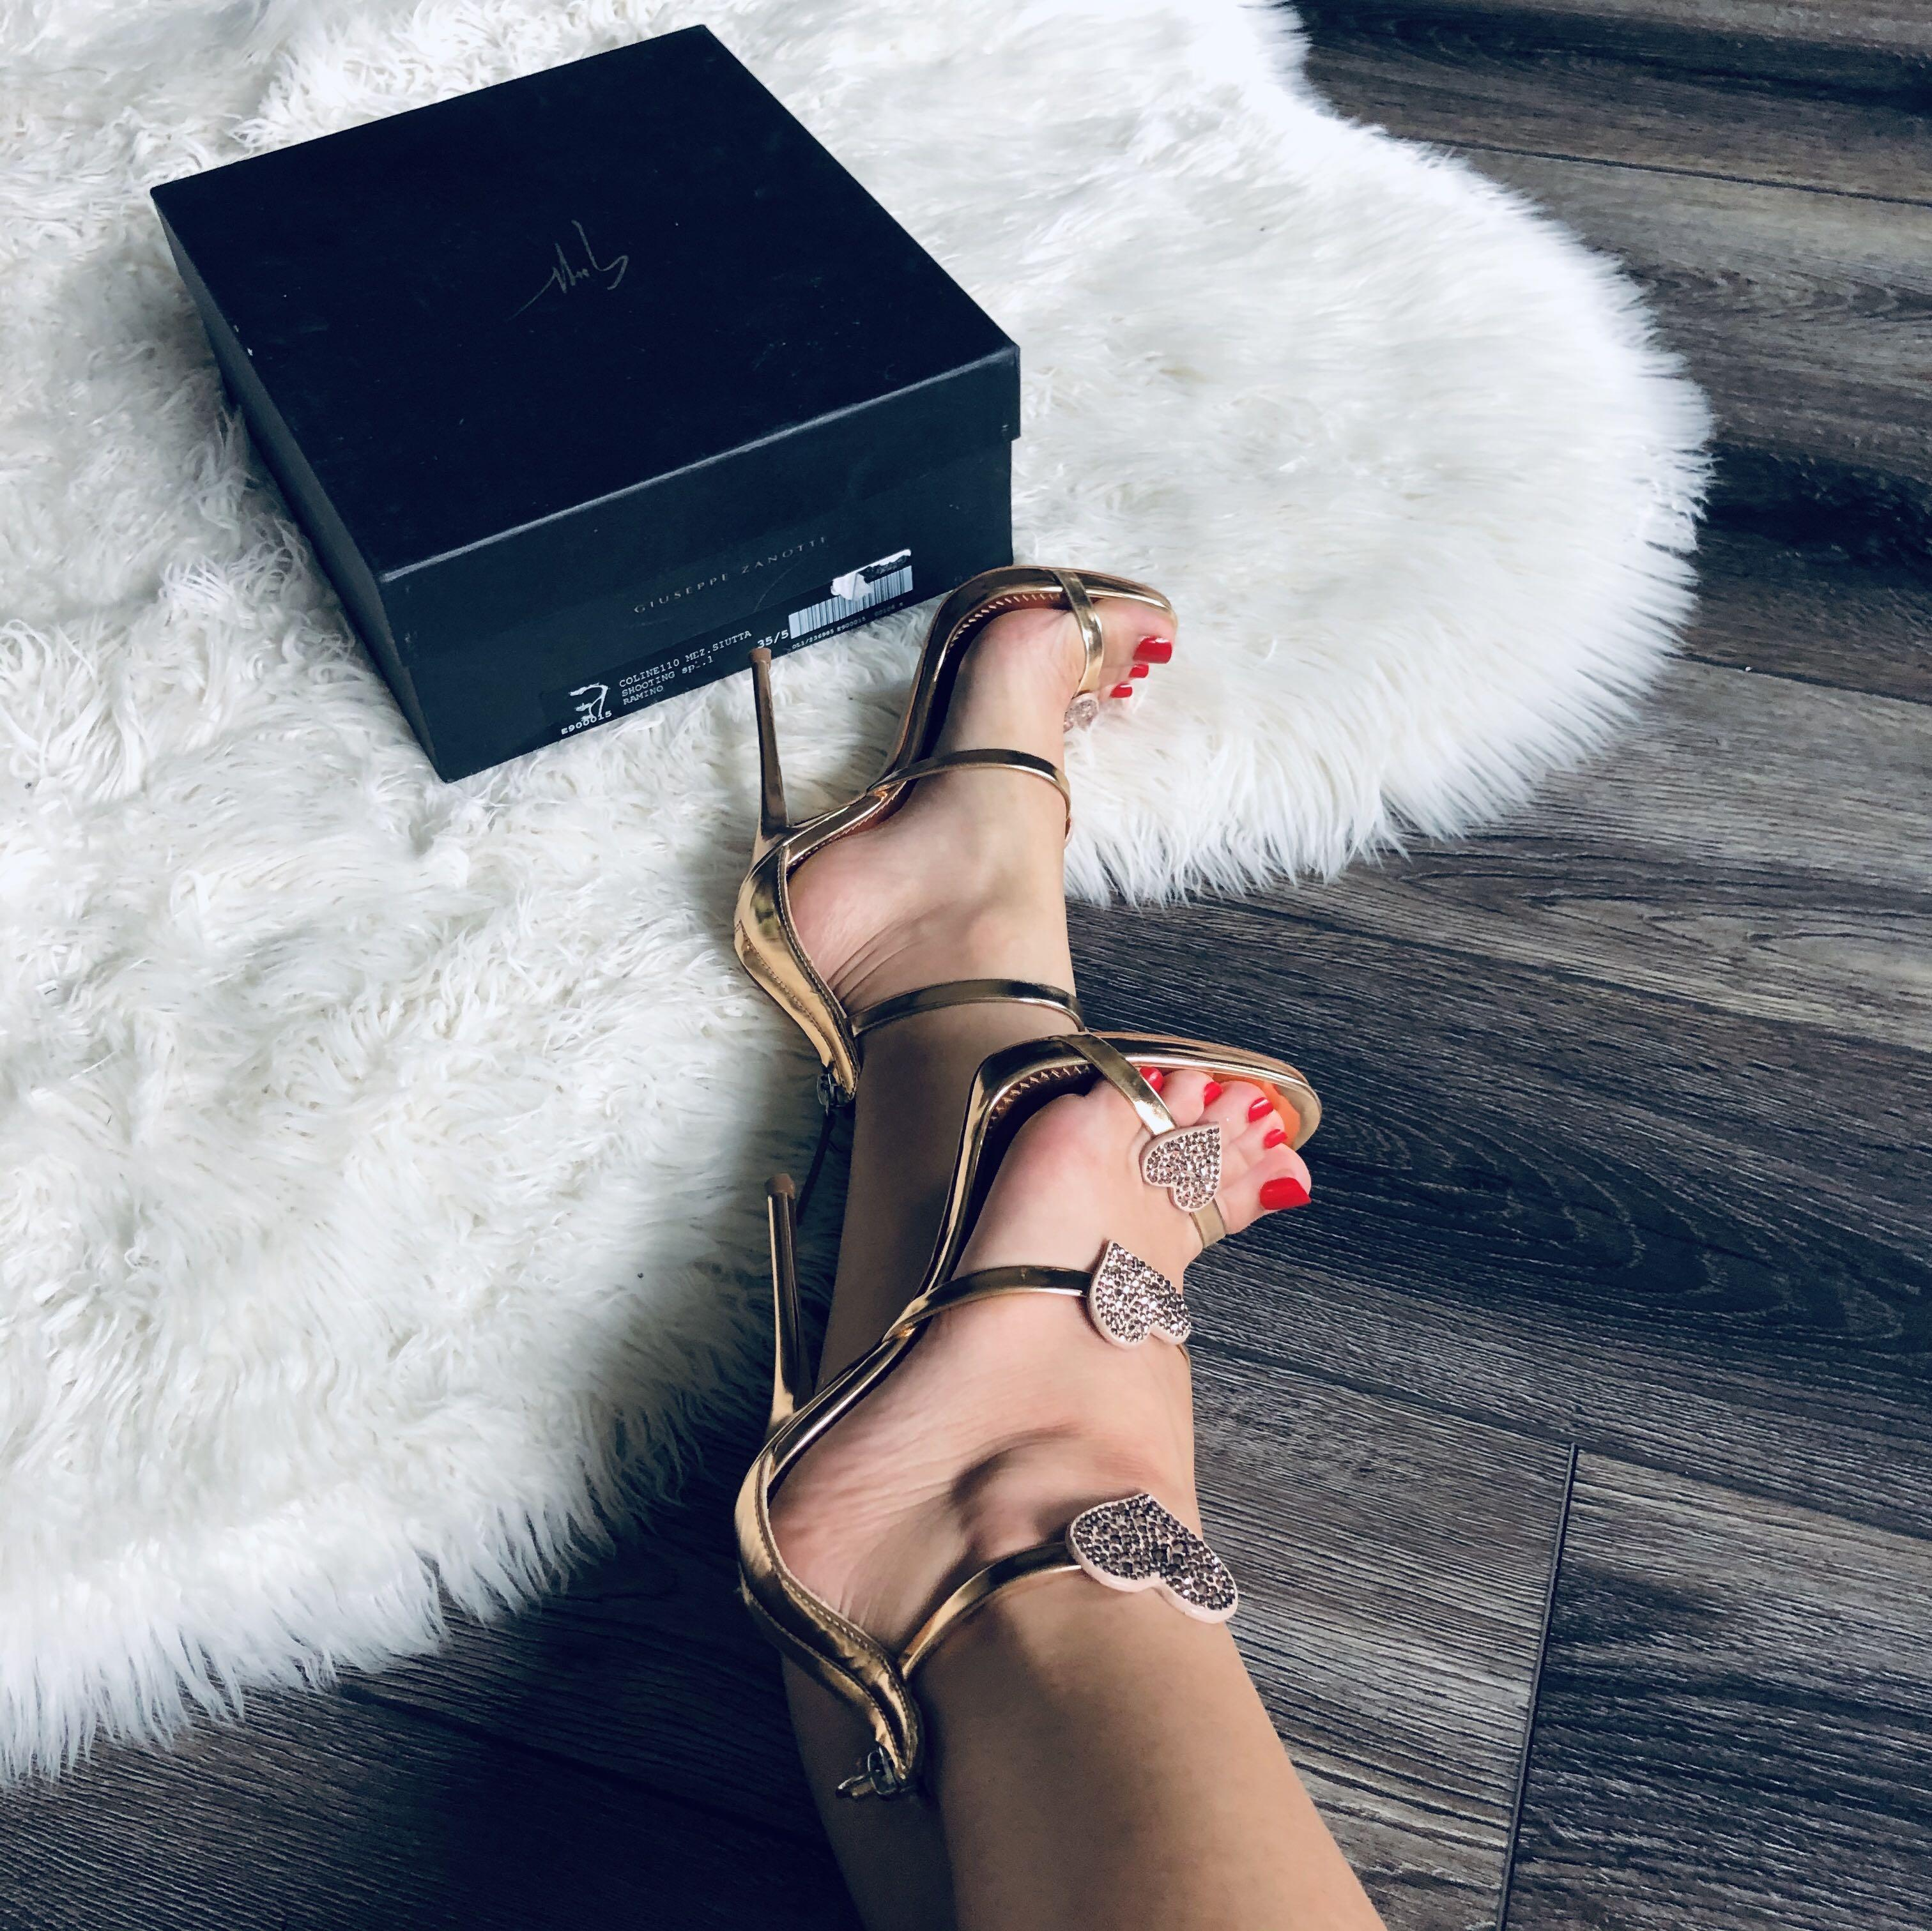 $1380 Giuseppe Zanotti sandals 35.5 / 5.5